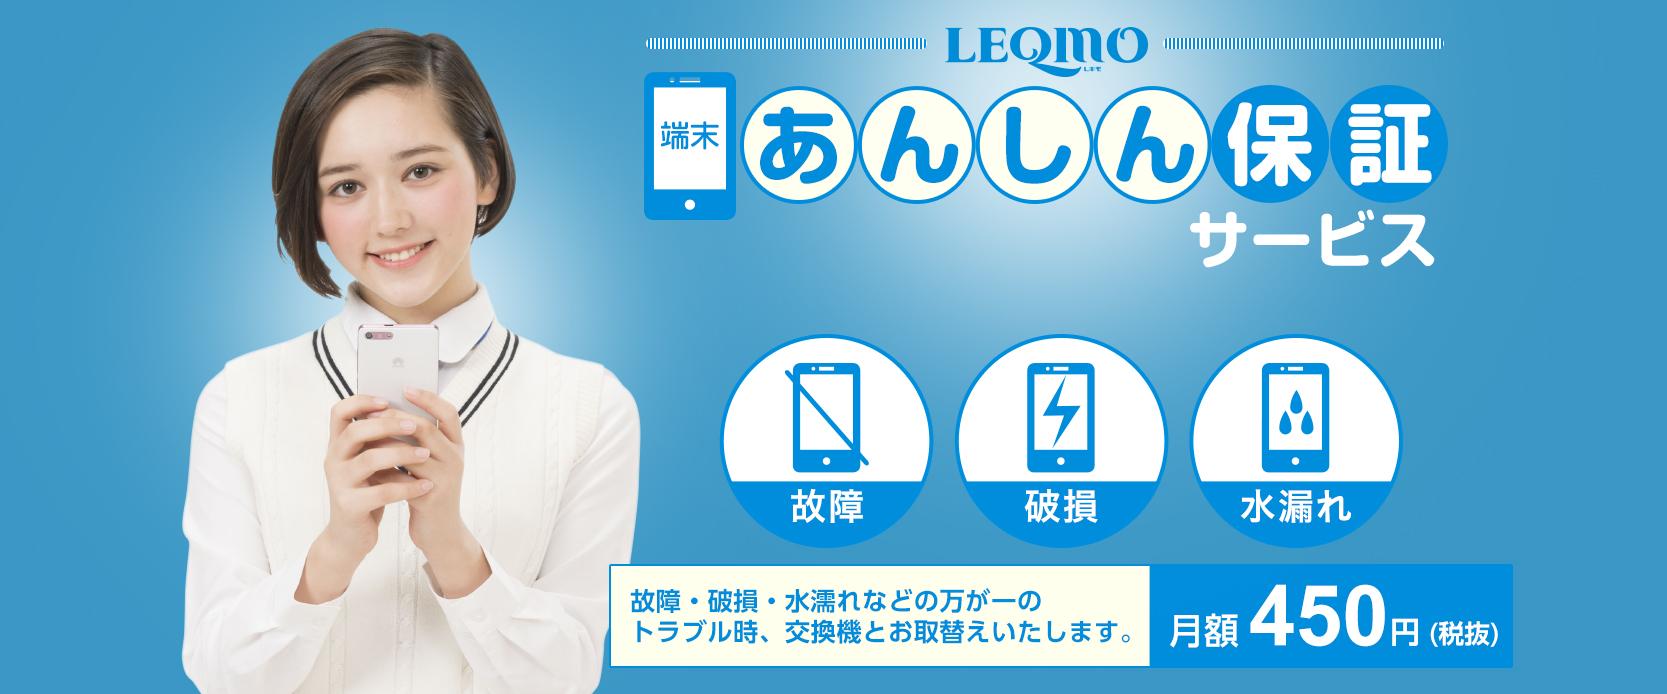 leqmo端末あんしん保証サービス